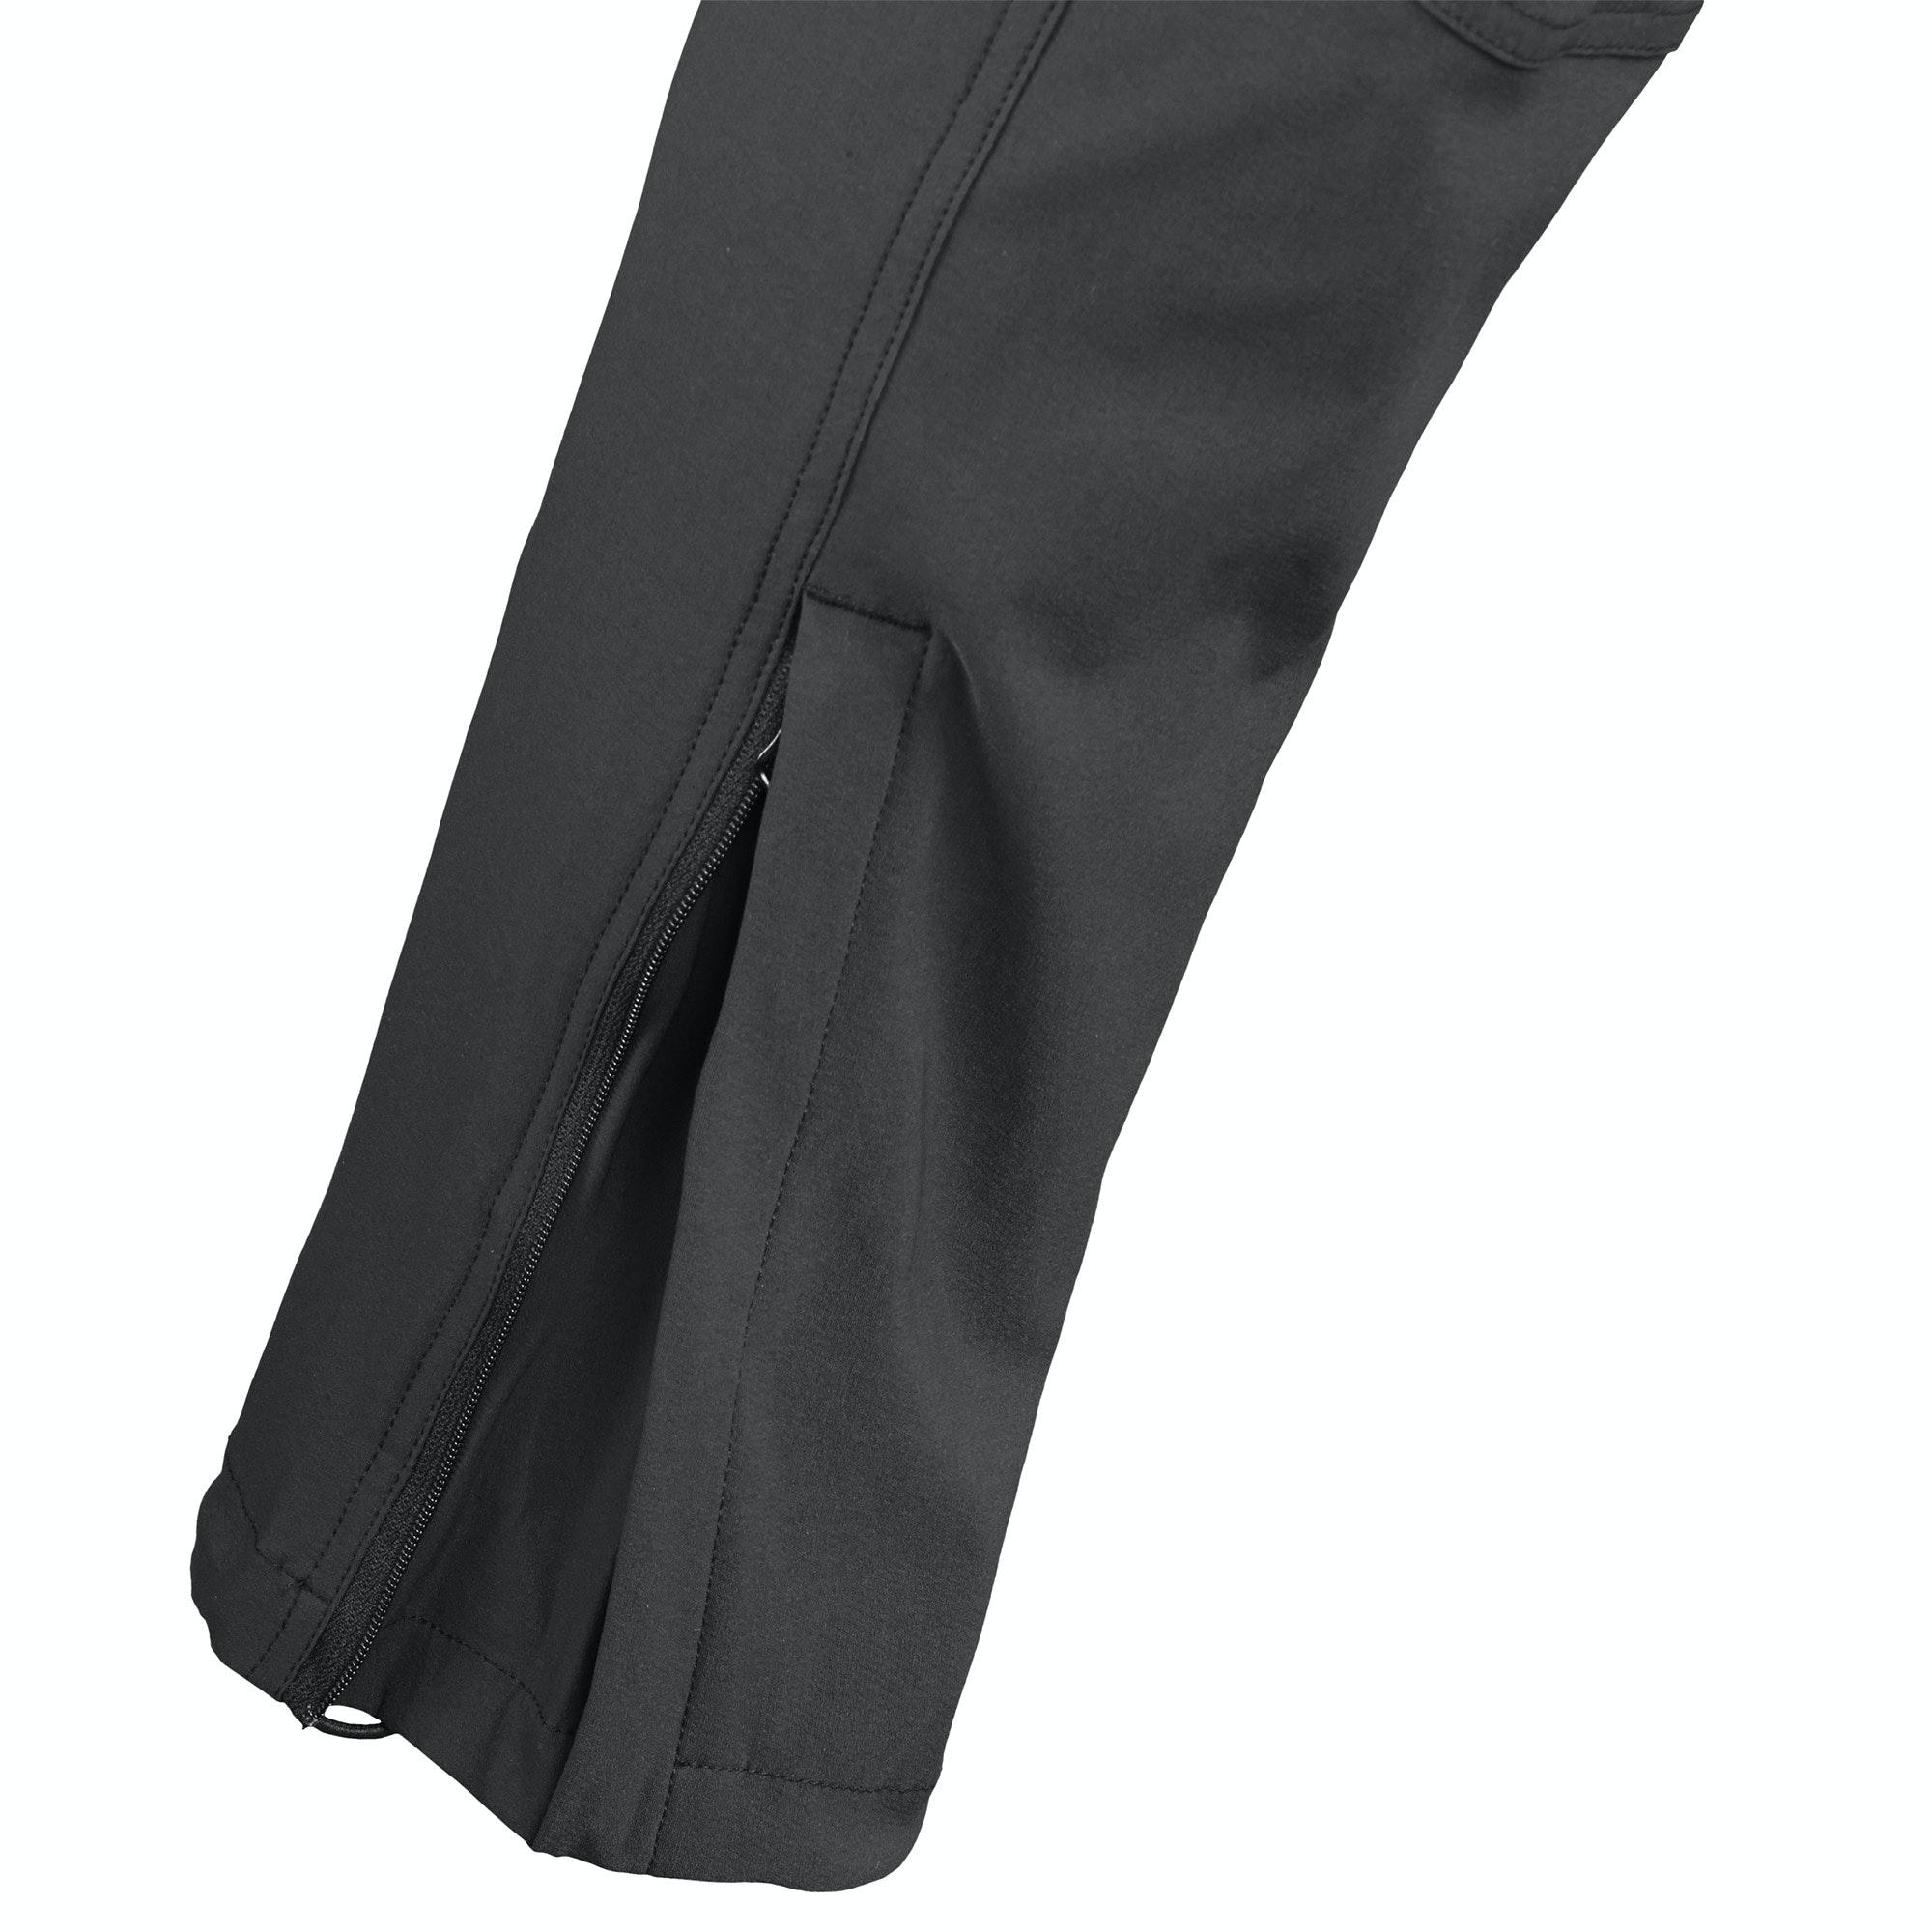 NEW-Kathmandu-Eris-Women-039-s-Softshell-Hiking-Pants-Trousers-v2-Zip-Hem-Over-Boots thumbnail 8